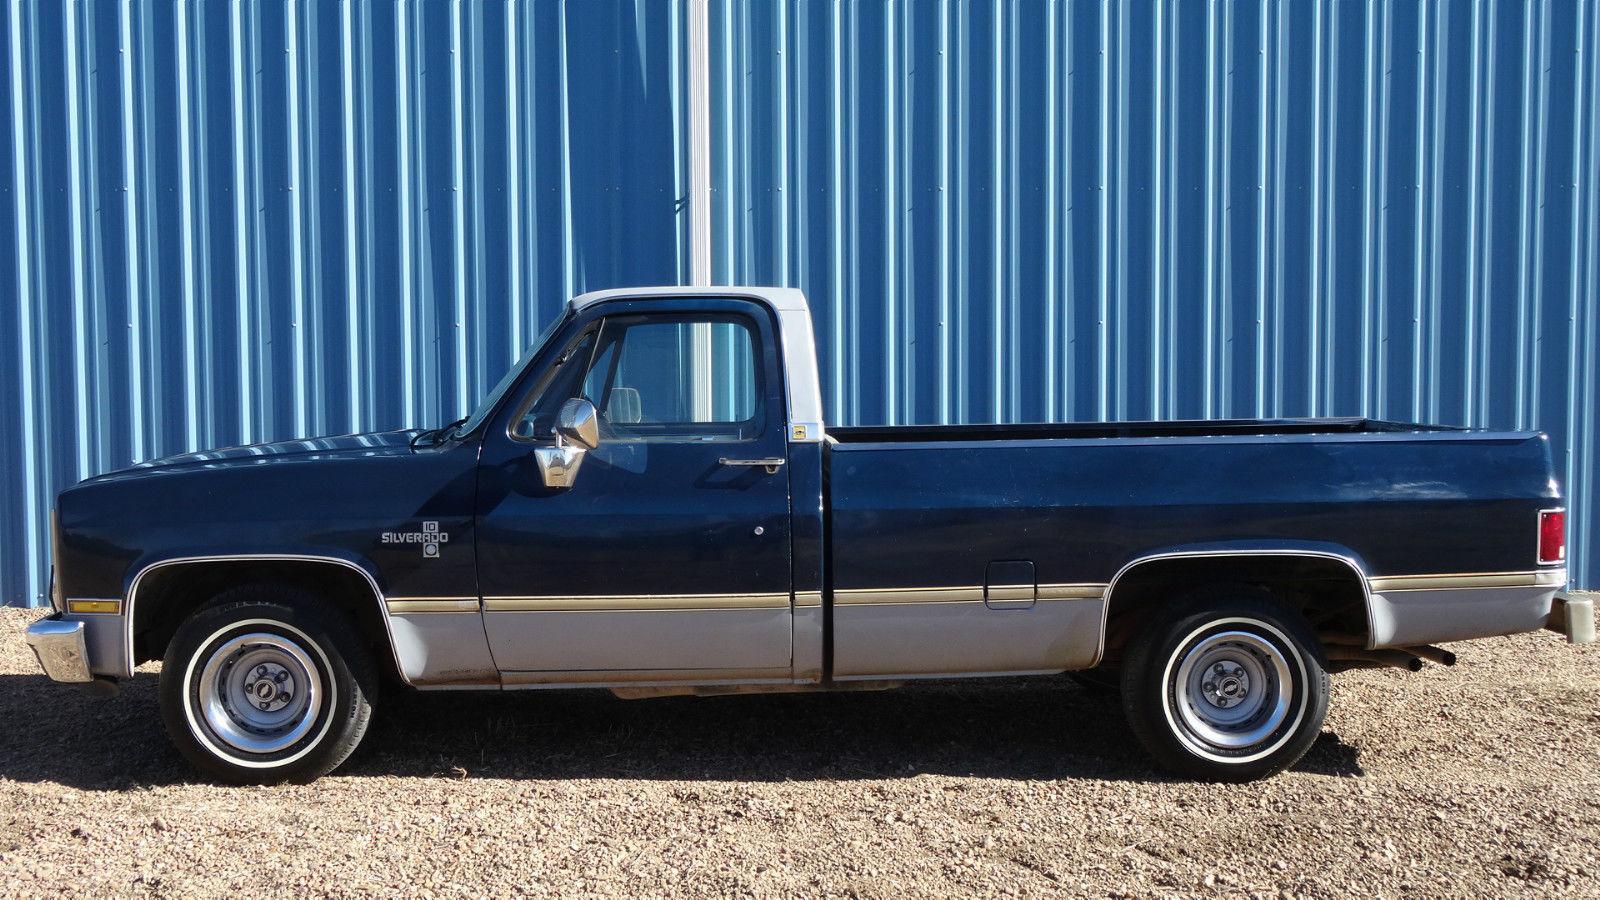 1985 chevrolet c 10 silverado longbed pickup truck for sale. Black Bedroom Furniture Sets. Home Design Ideas